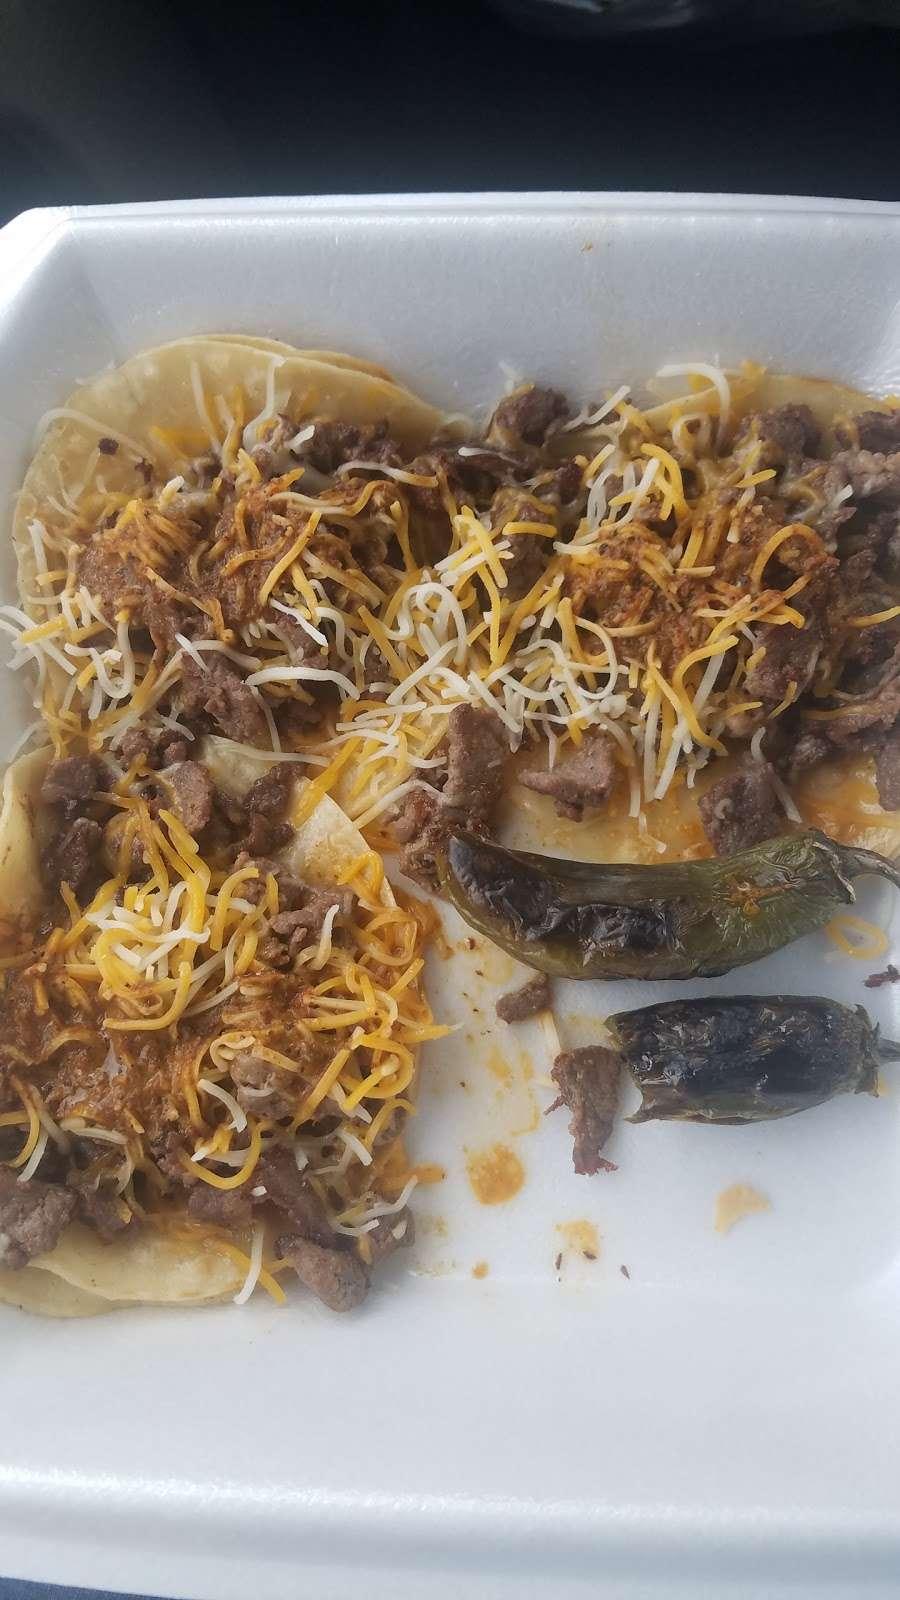 El Vergel Taco truck - restaurant    Photo 1 of 2   Address: Platteville, CO 80651, USA   Phone: (970) 302-4510